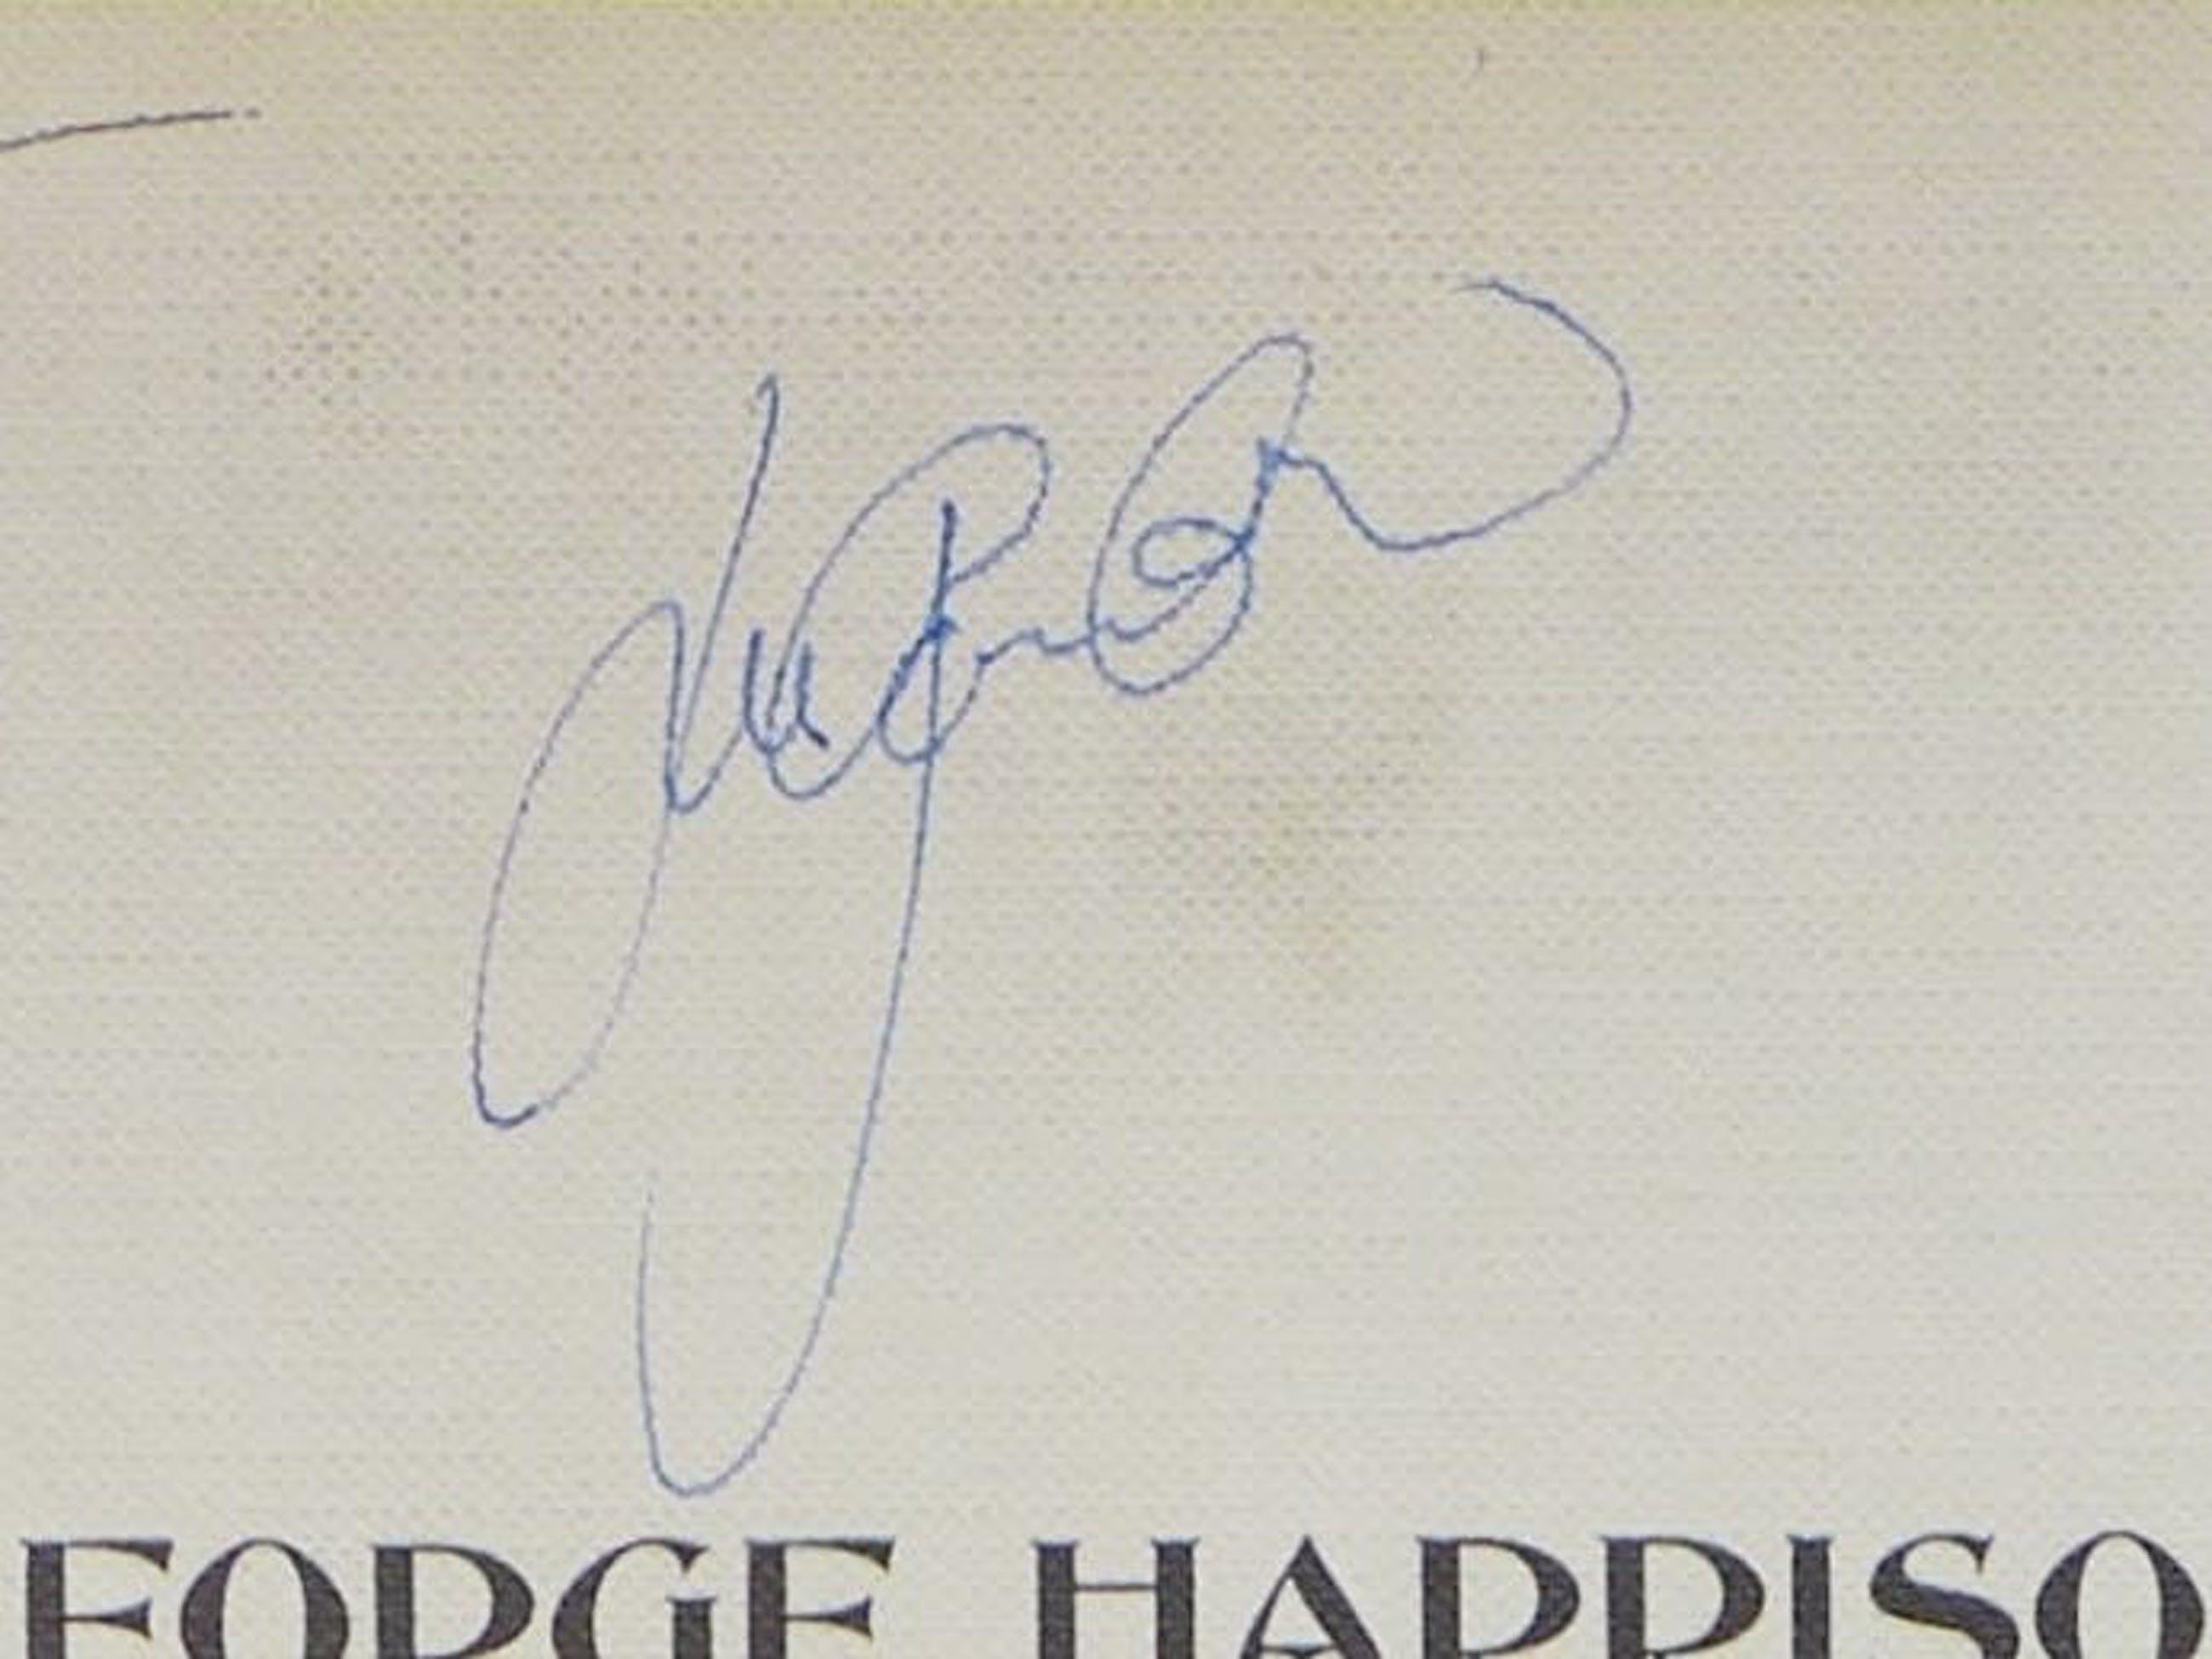 George Harrison - All Things Must Pass, 3 LP Box Poster signiert von Harrison, Starr, Clapton +4 kopen? Bied vanaf 99!